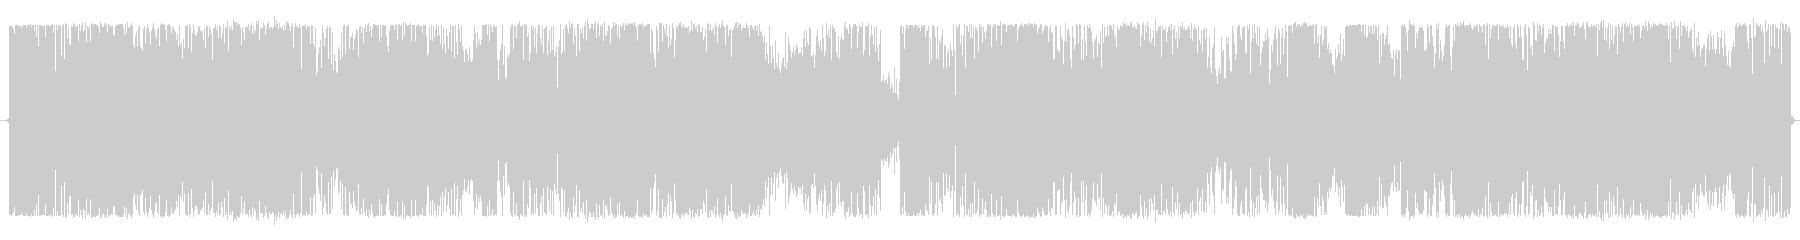 electloloopの未再生の波形